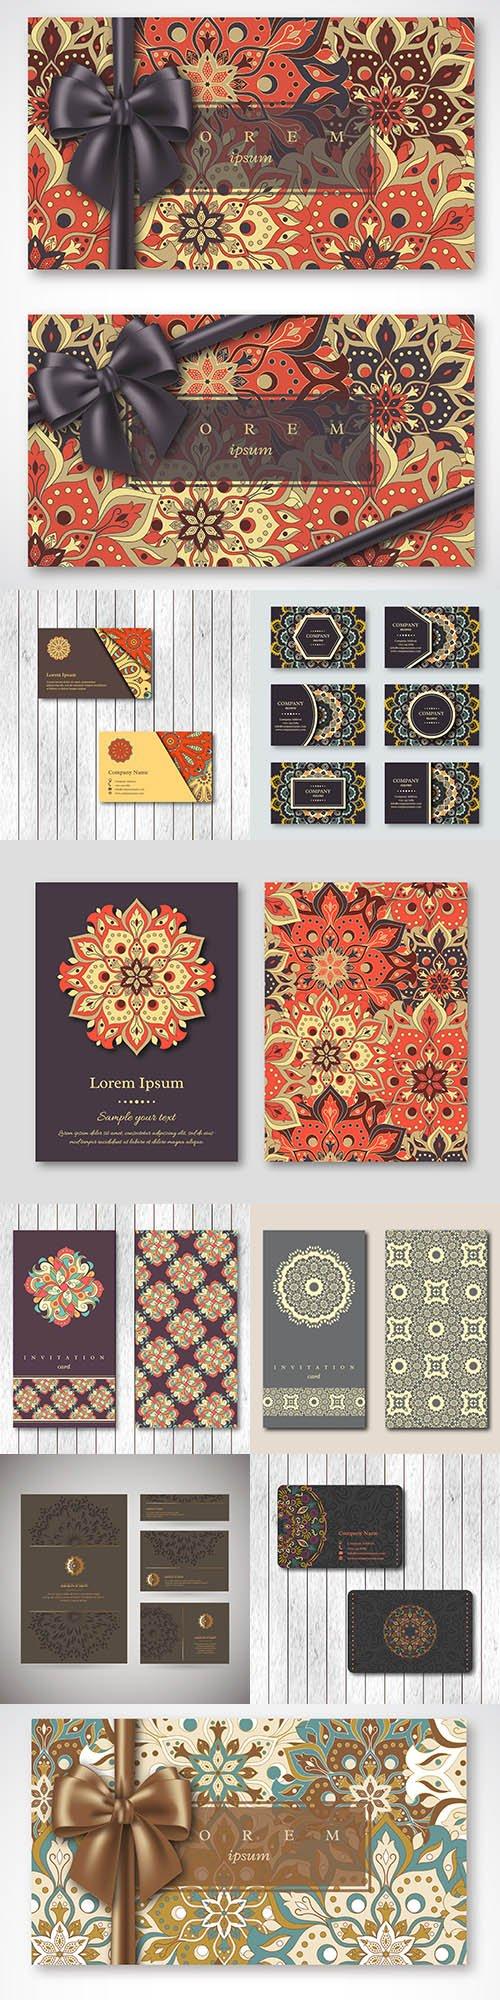 Card and invitation set templates with drawn mandala